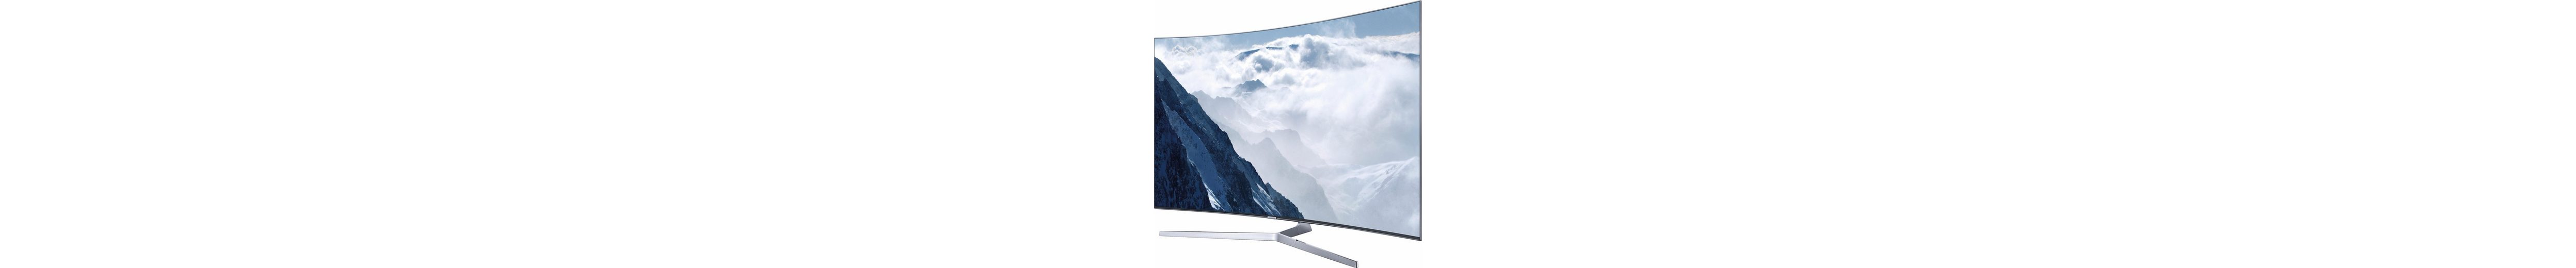 Samsung UE78KS9590UXZG, Curved-LED-Fernseher, 198 cm (78 Zoll), 2160p (SUHD), Smart-TV